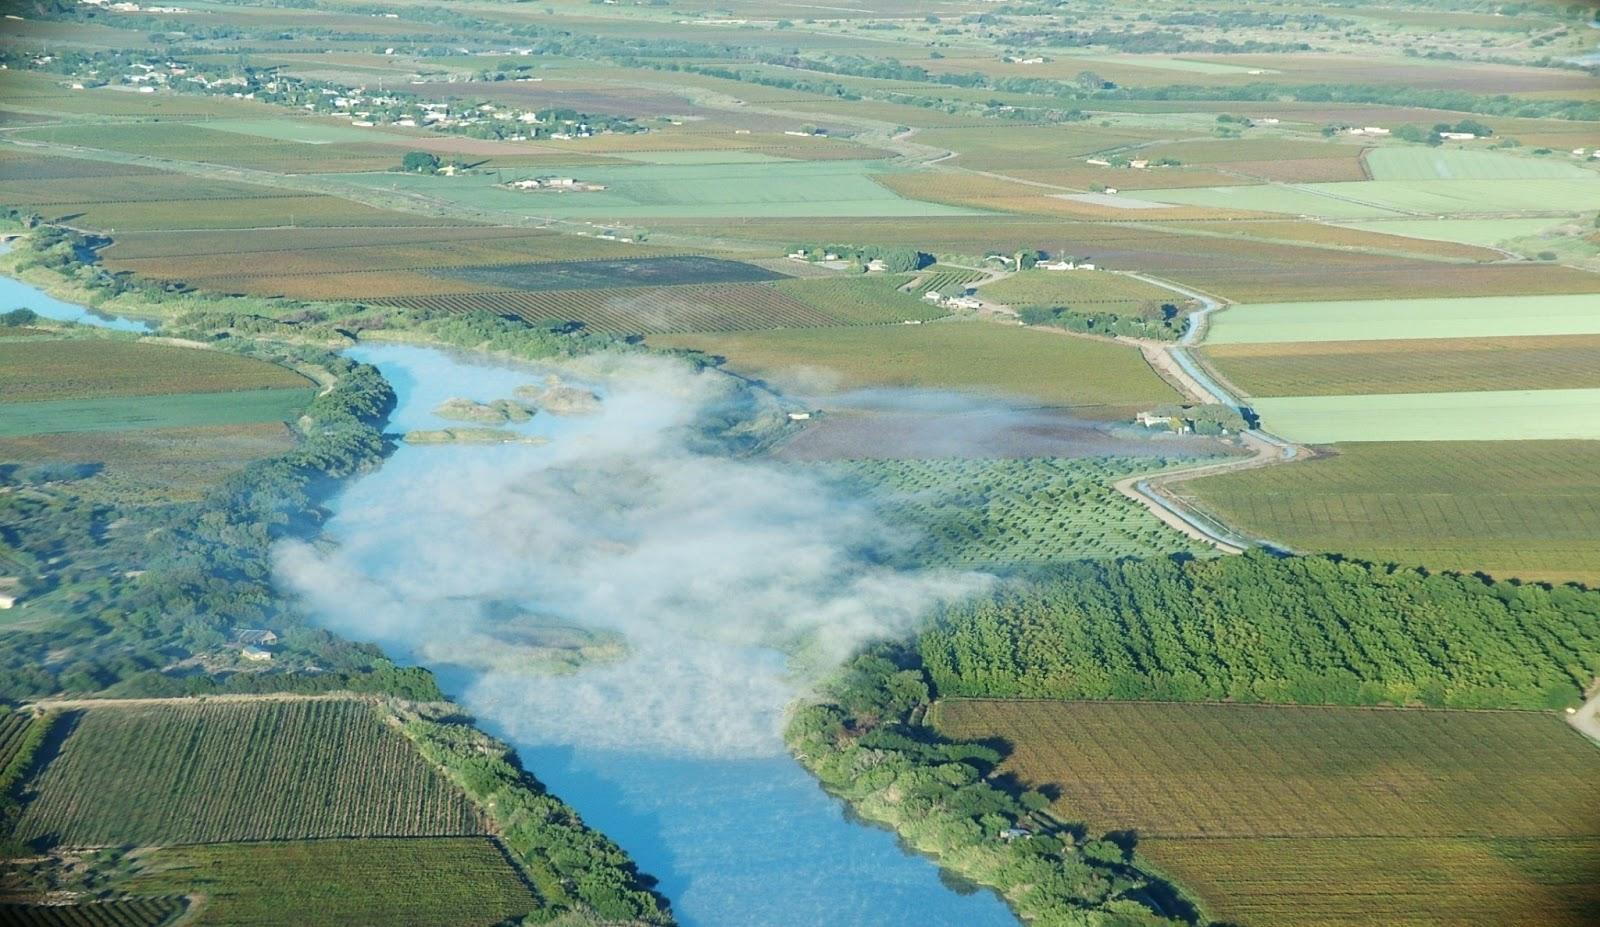 The Orange River in South